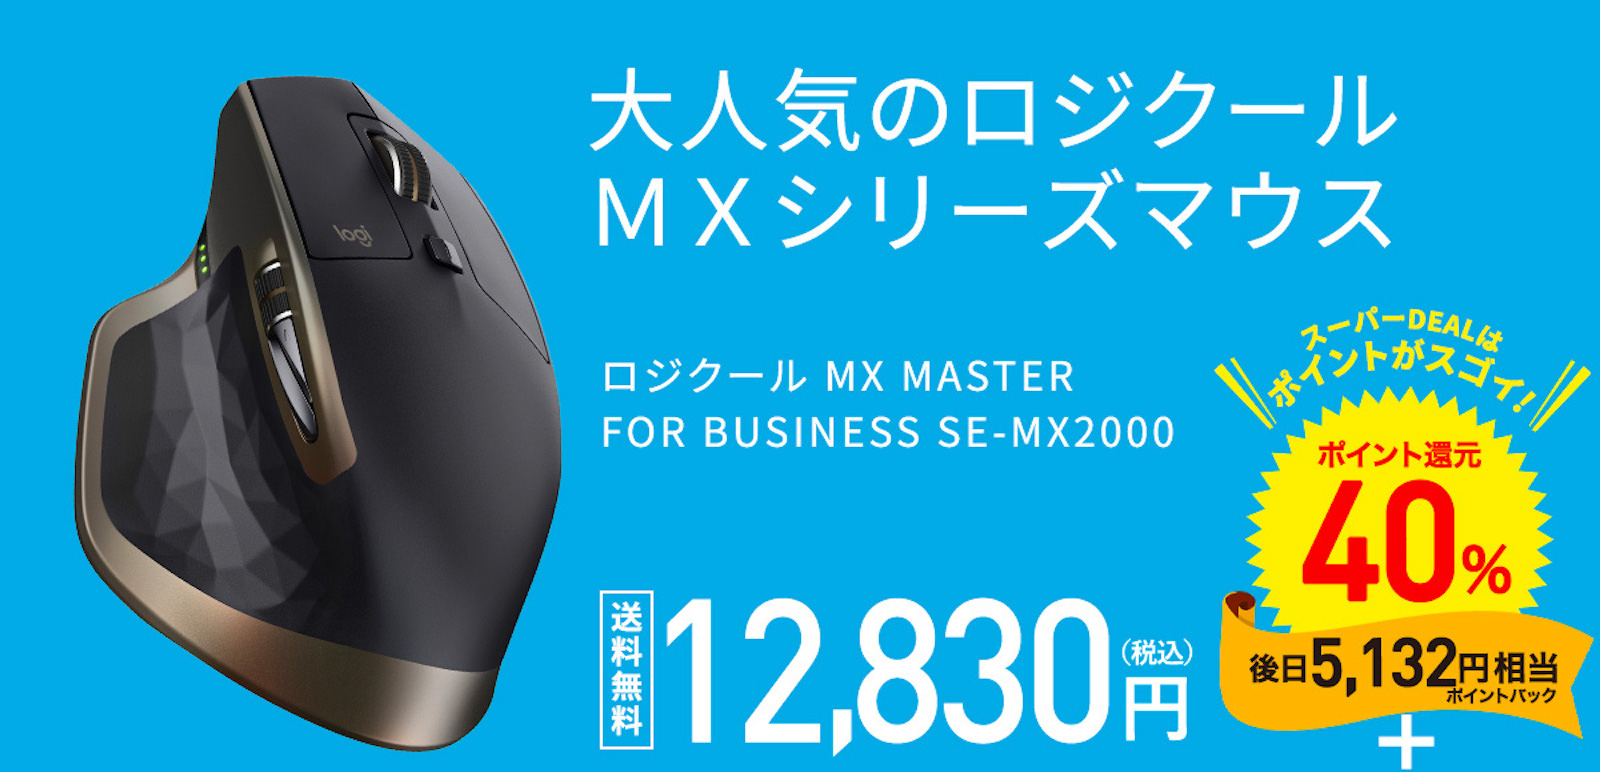 MX Master MX2000 Sale